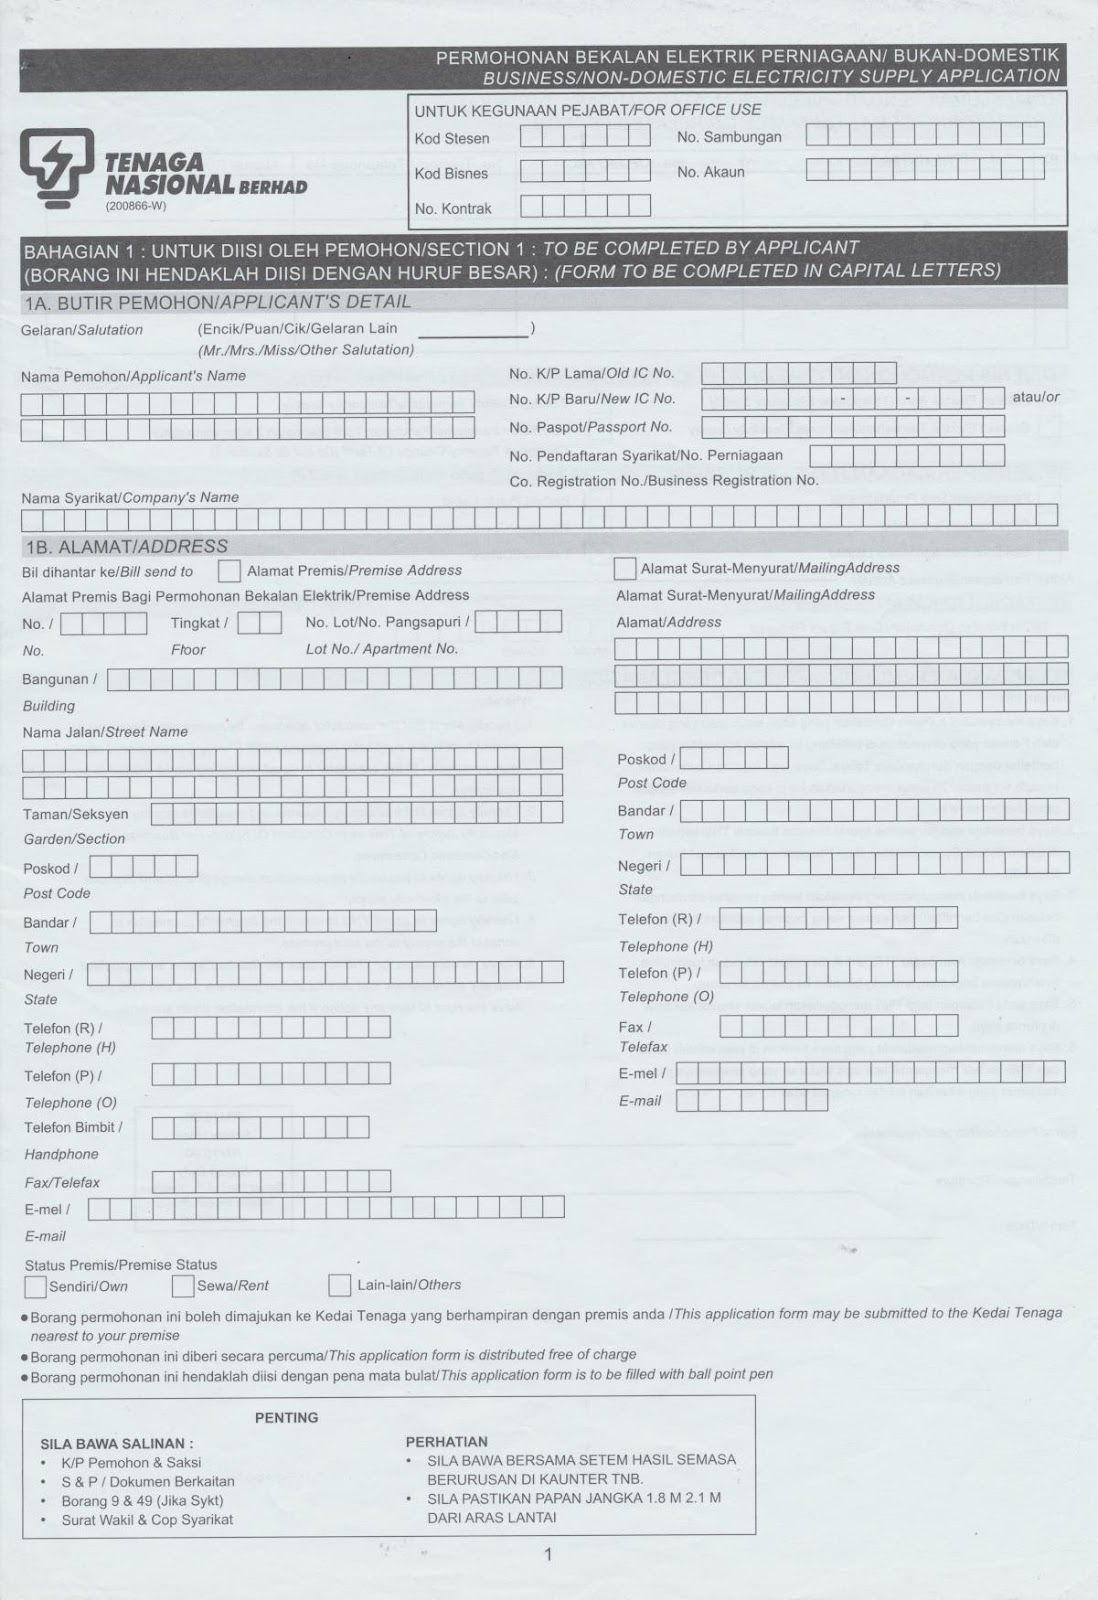 Hin Yeap Electrical Works Electrical Contractor Tnb Application Form Business Non Domestic Borang Permohonan Tnb Bekalan Elektrik Per Huruf Surat Blog